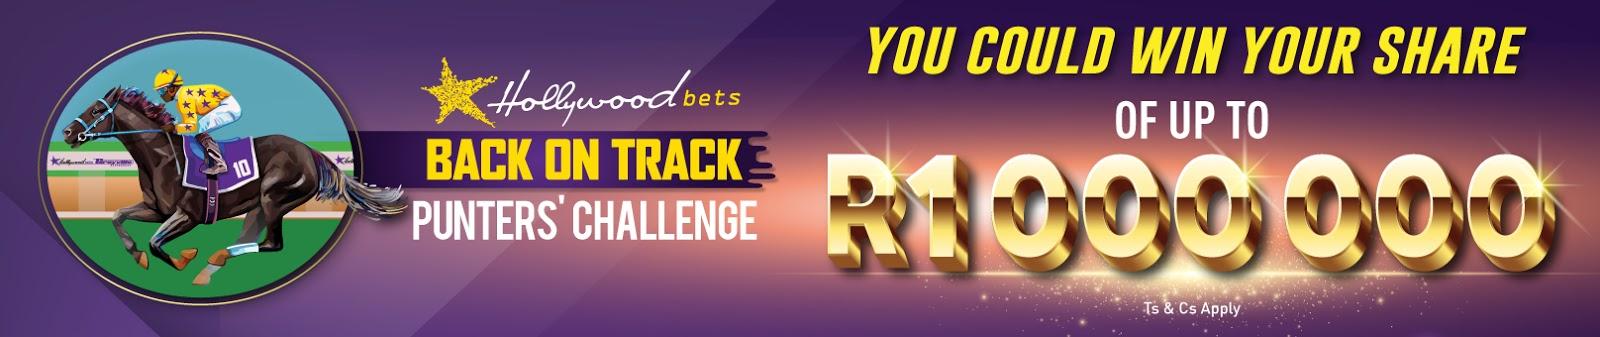 Hollywoodbets Back on Track Punters' Challenge